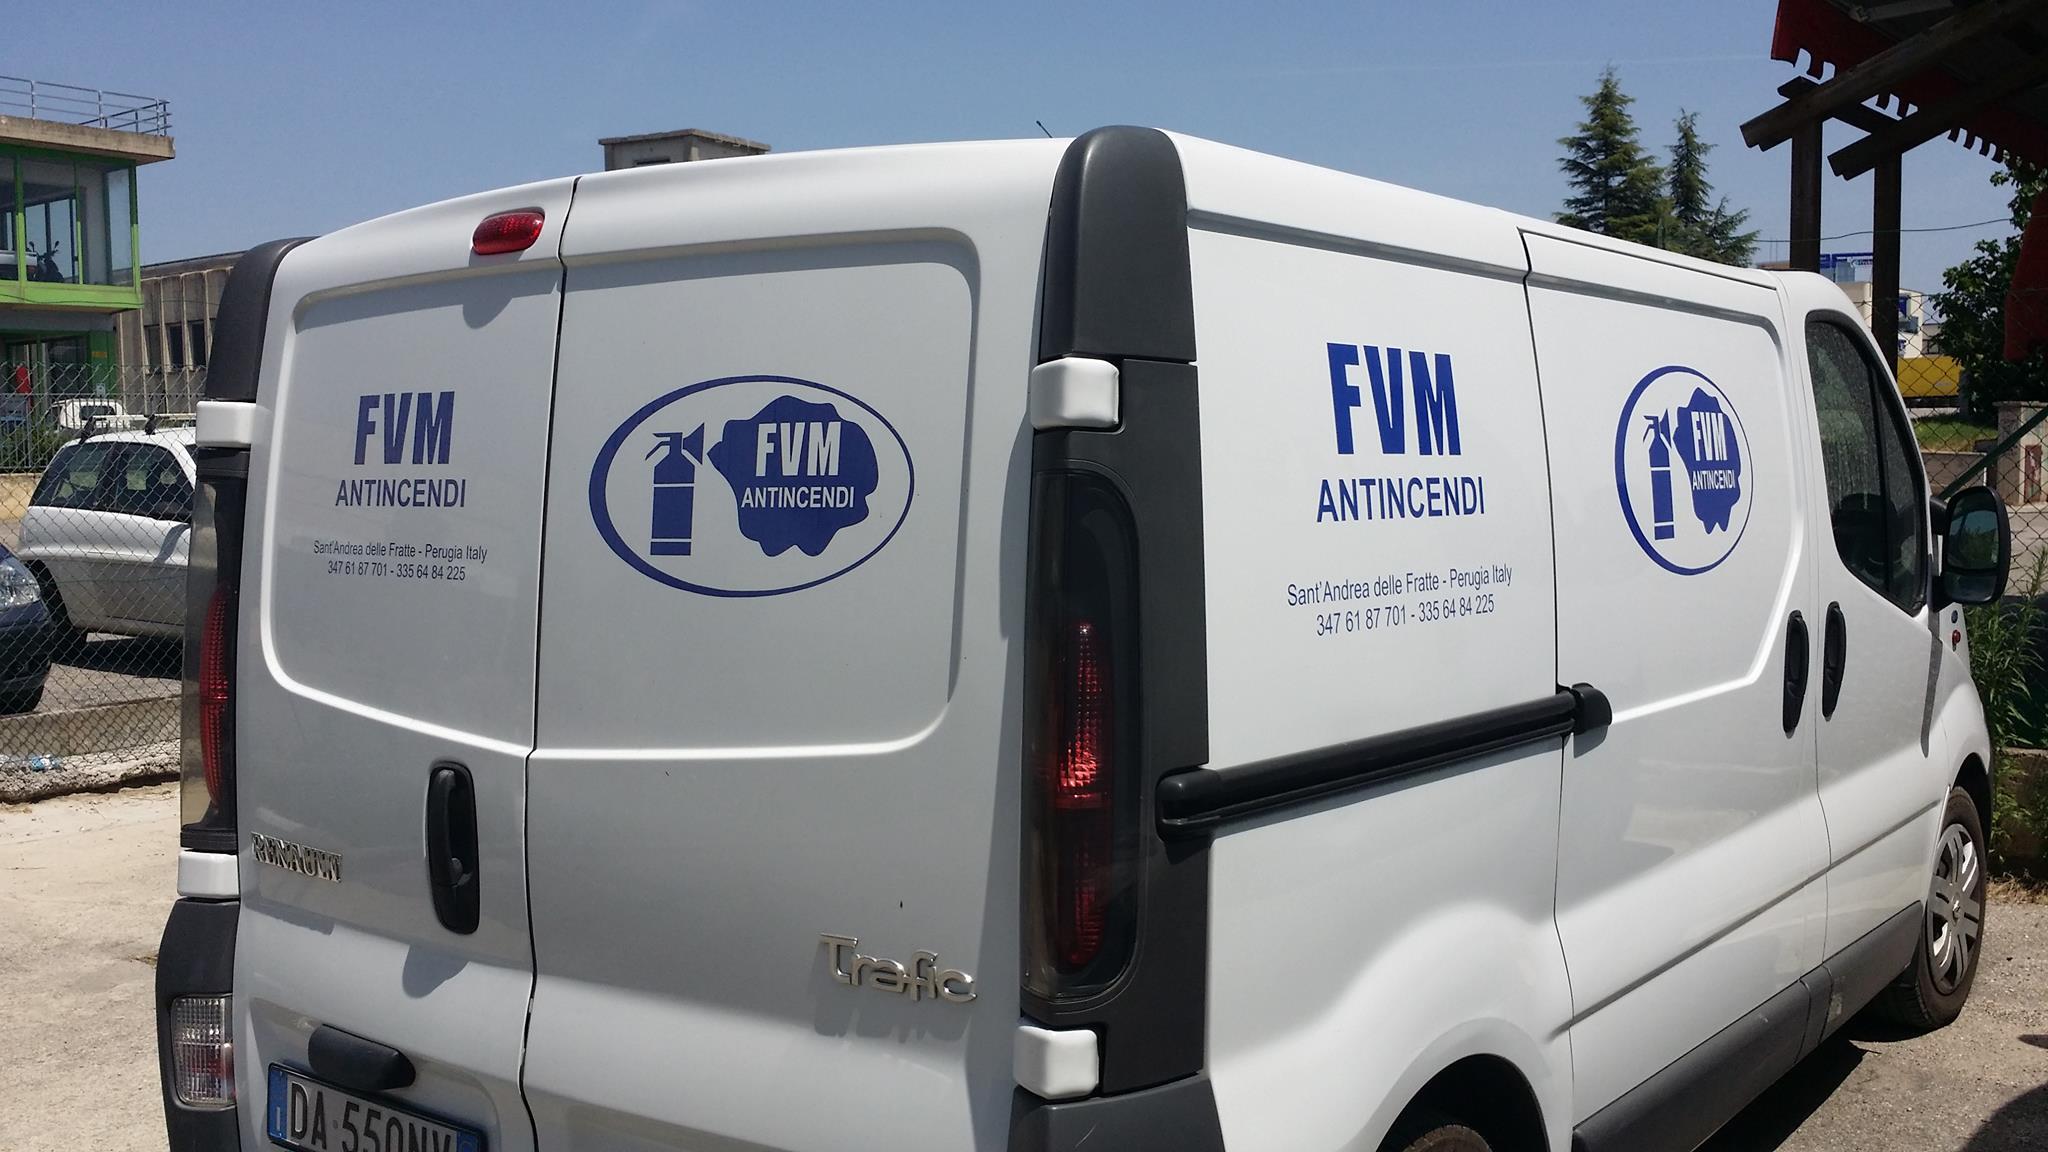 FVM ANTINCENDI - 1